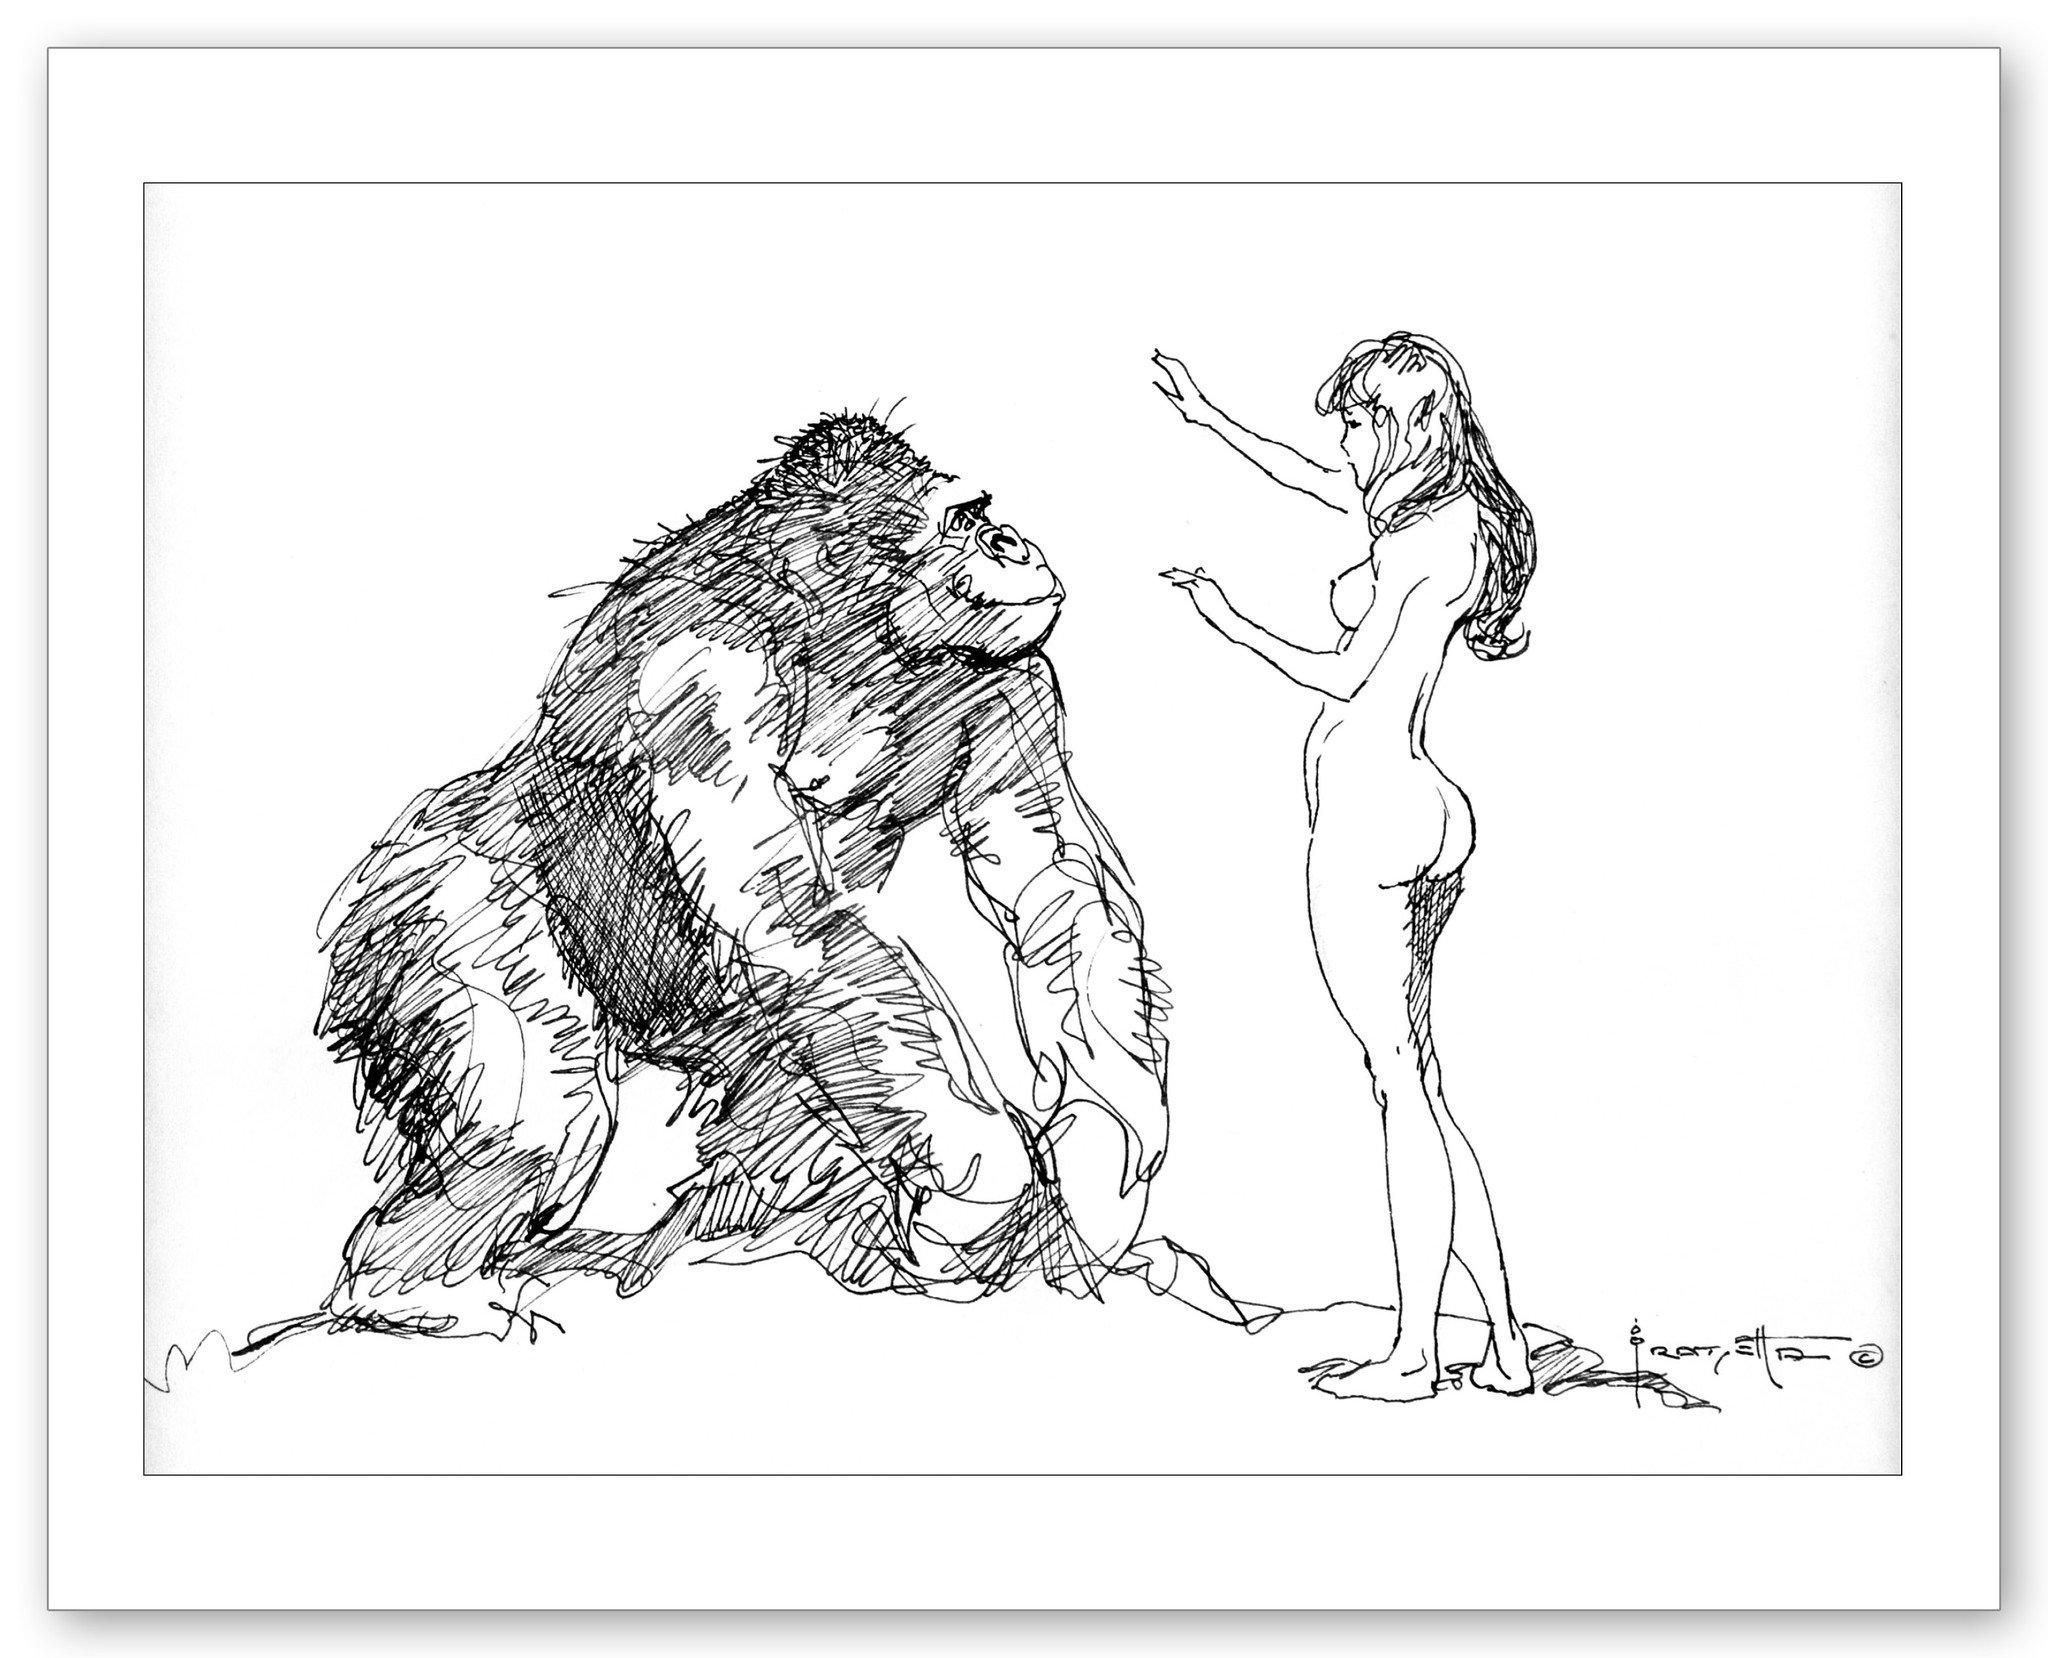 2048x1658 Gorilla And Girl Frazetta Girls, Llc